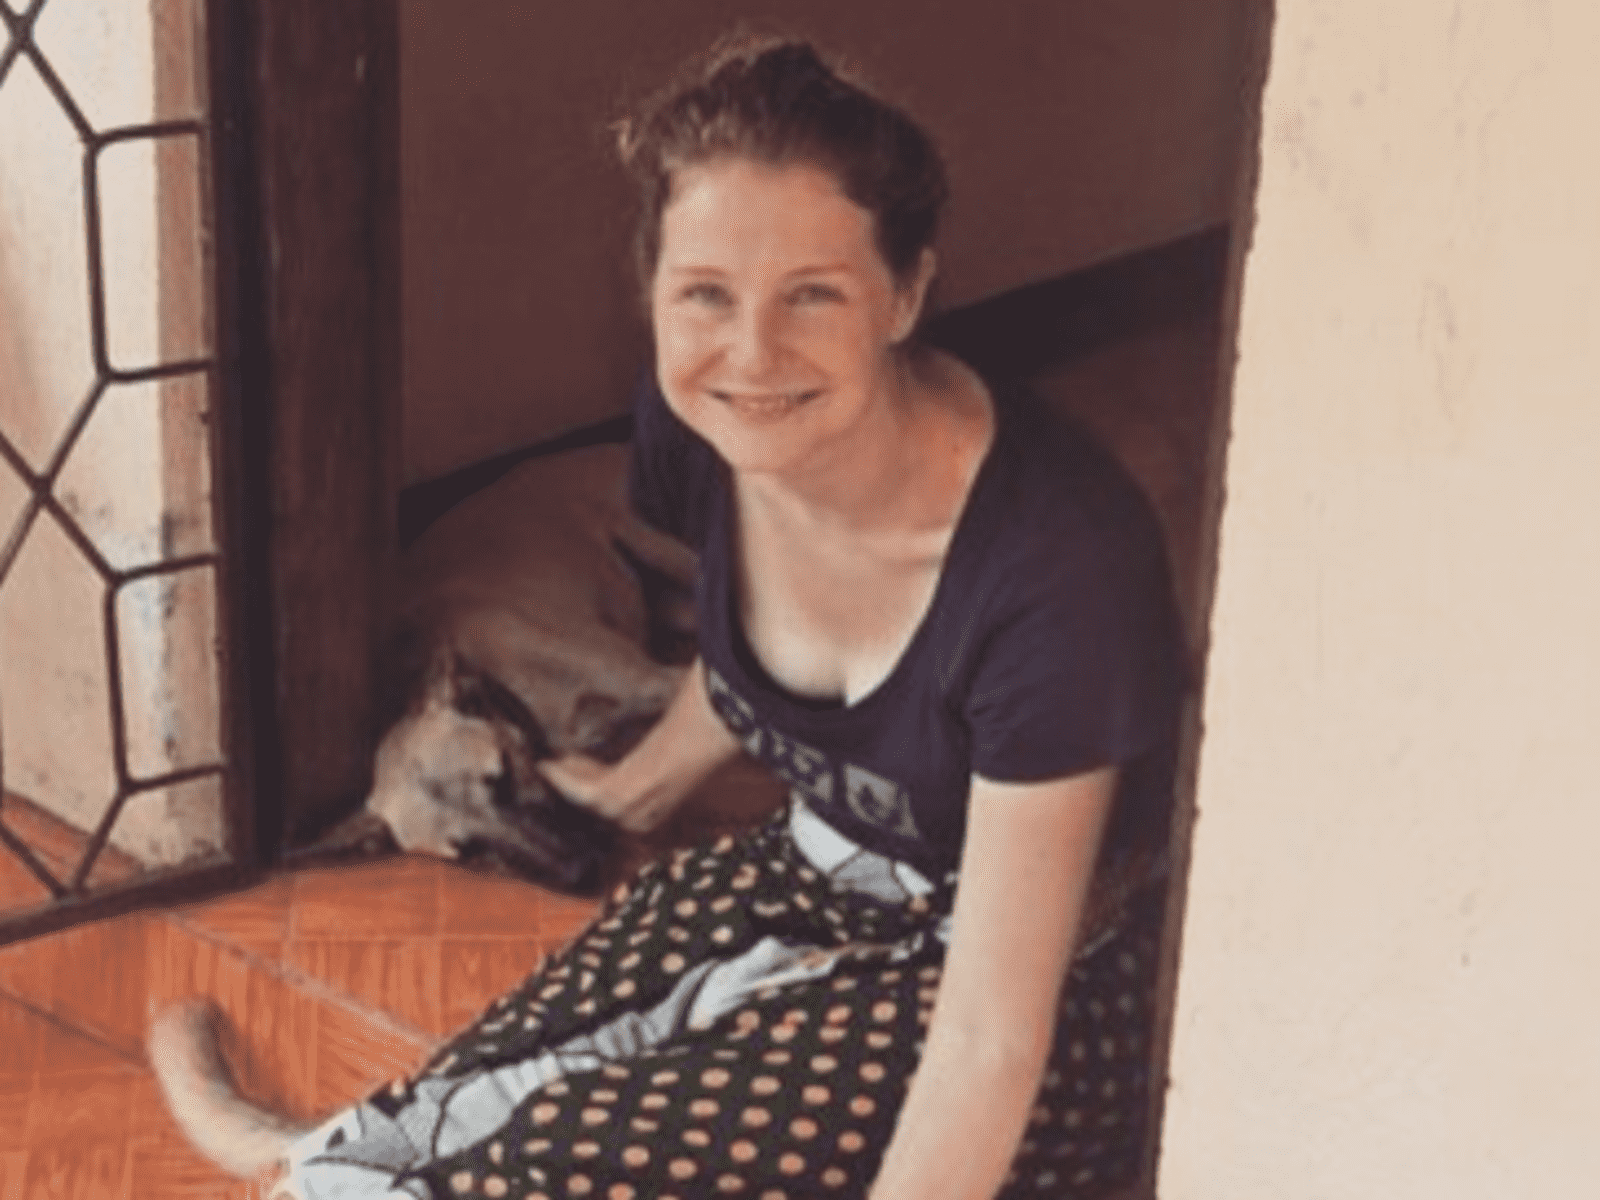 Joanne from Abingdon, United Kingdom